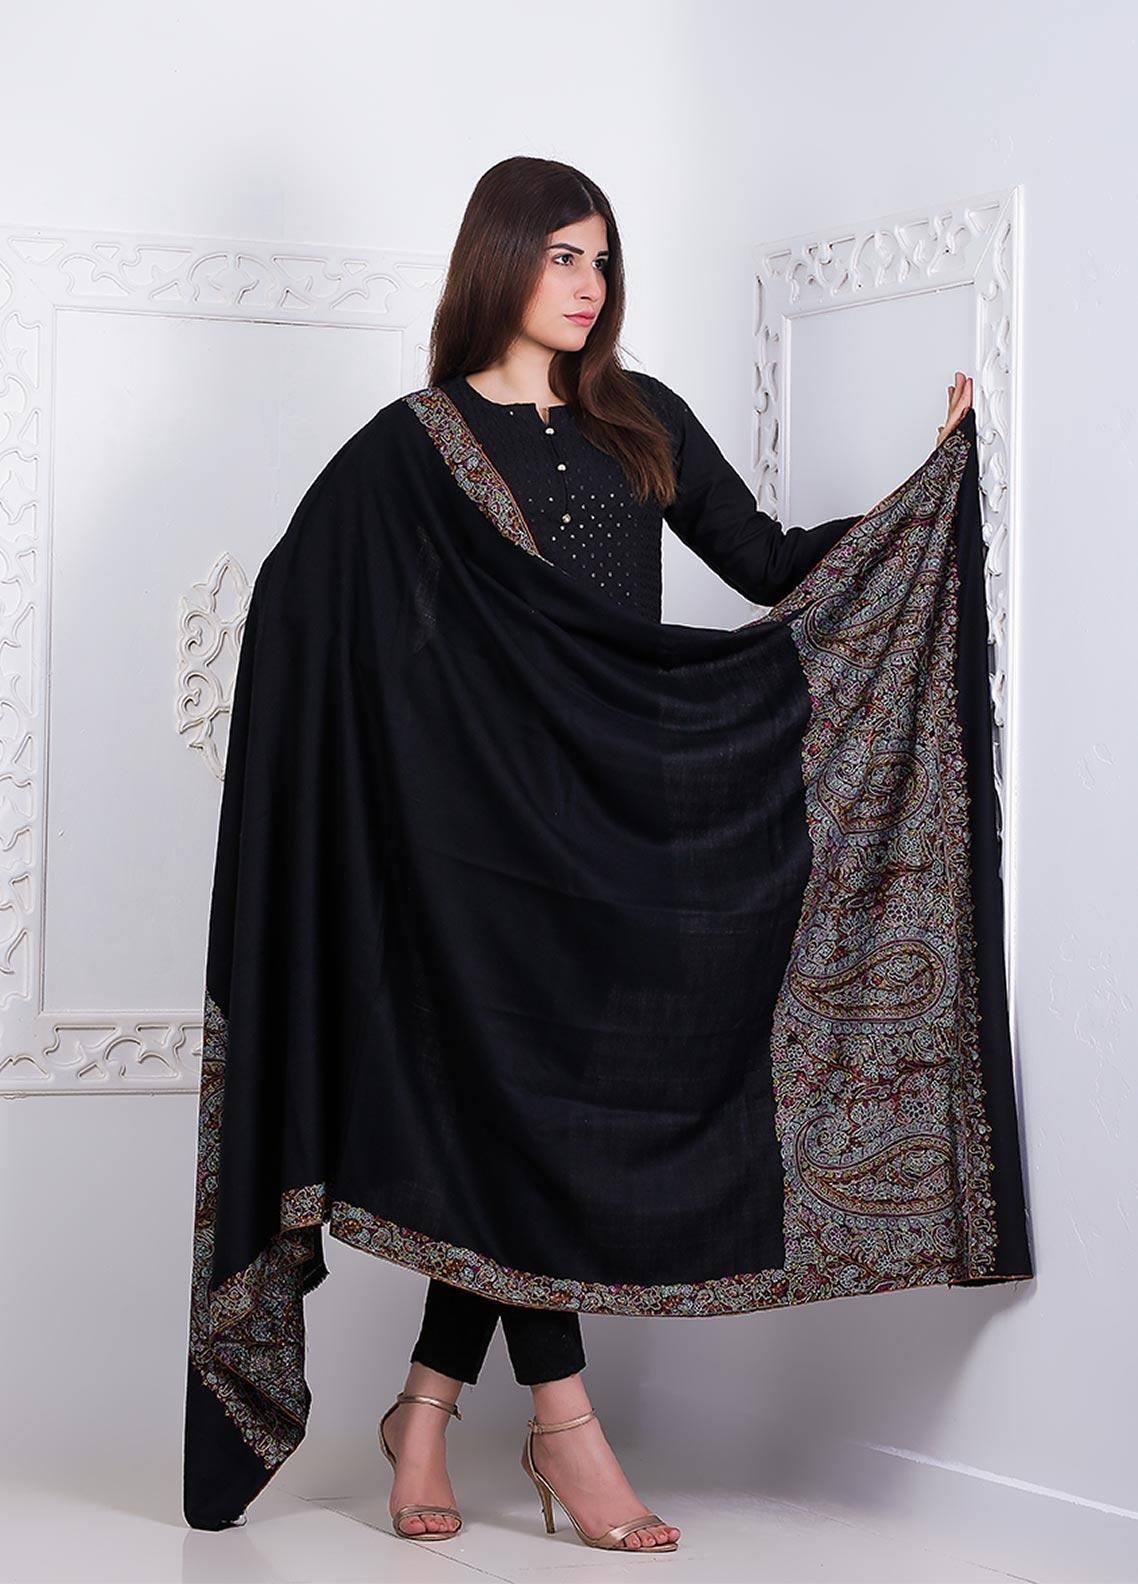 Sanaulla Exclusive Range Embroidered Pashmina  Shawl AKP-03 Black - Pashmina Shawls